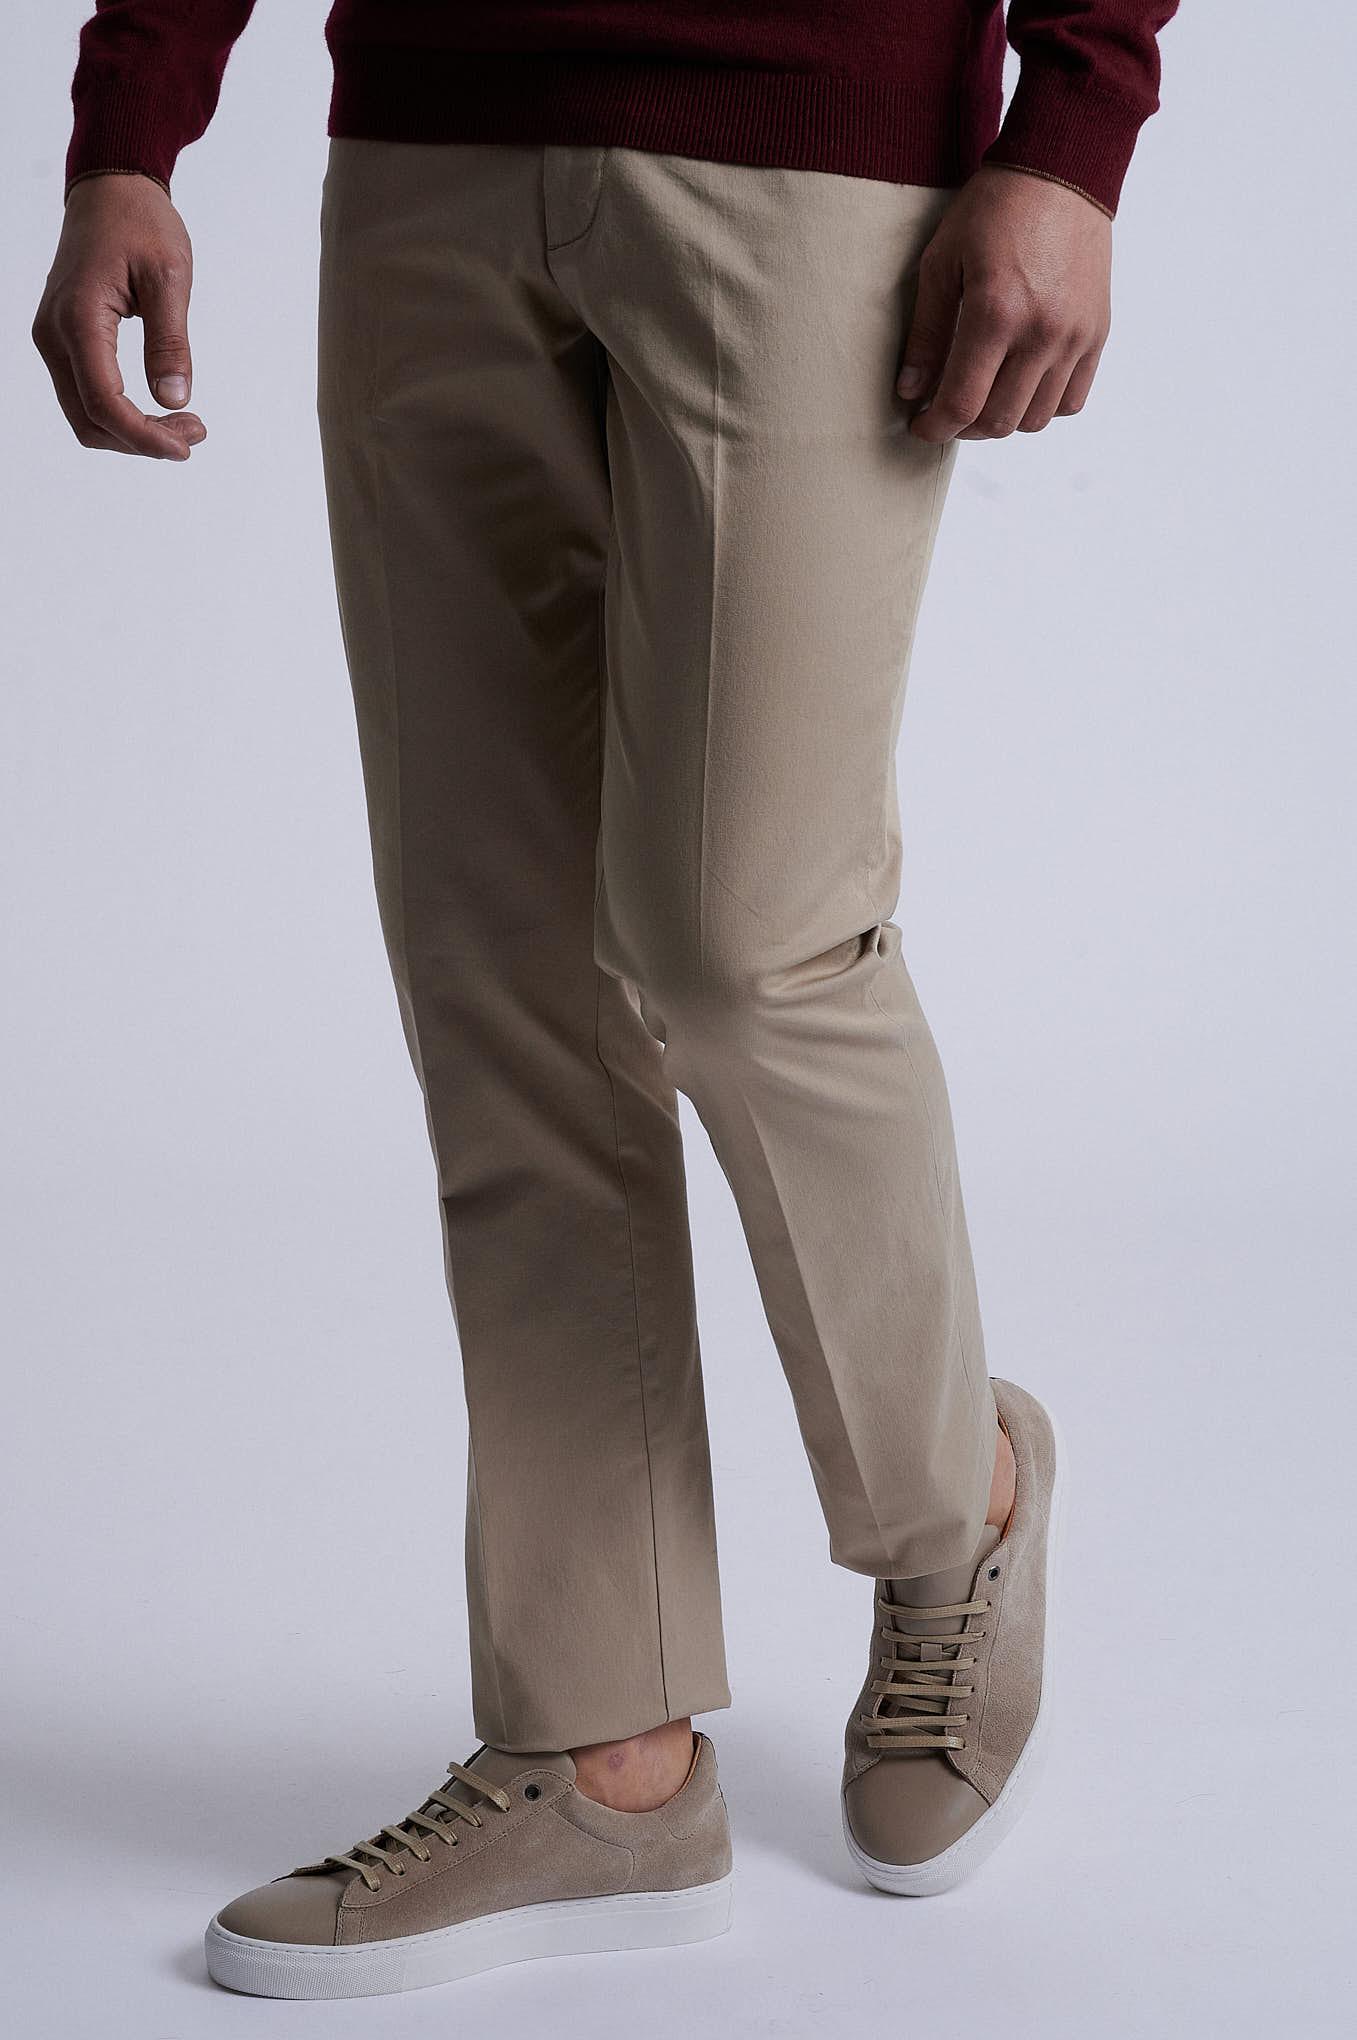 Chino Trousers Beige Sport Man